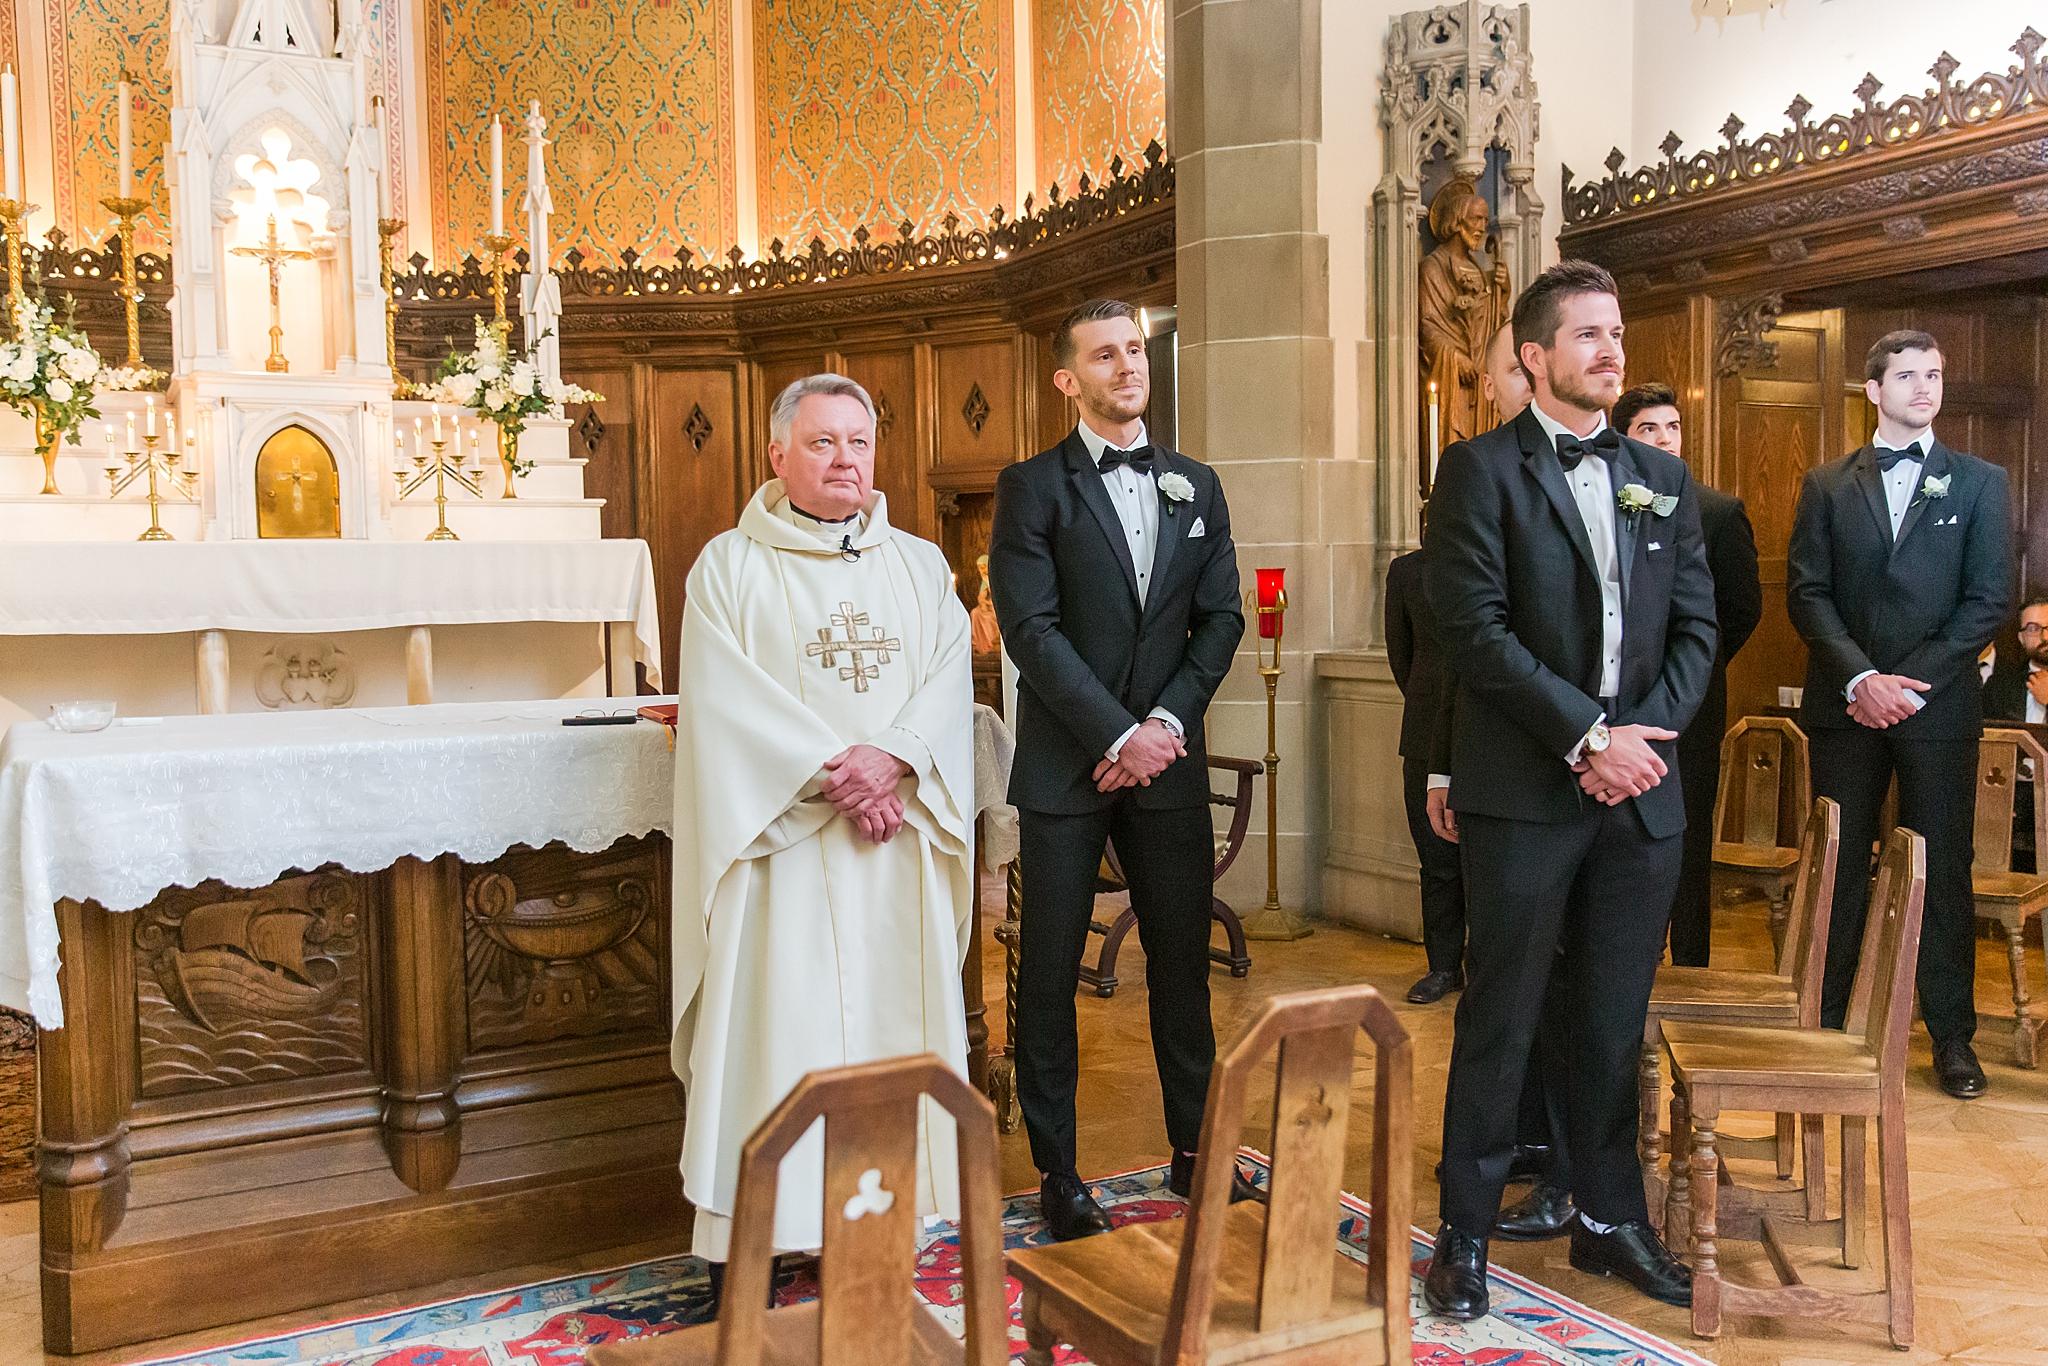 detroit-wedding-photographer-grosse-pointe-academy-chapel-detroit-golf-club-wedding-carly-matt-by-courtney-carolyn-photography_0032.jpg